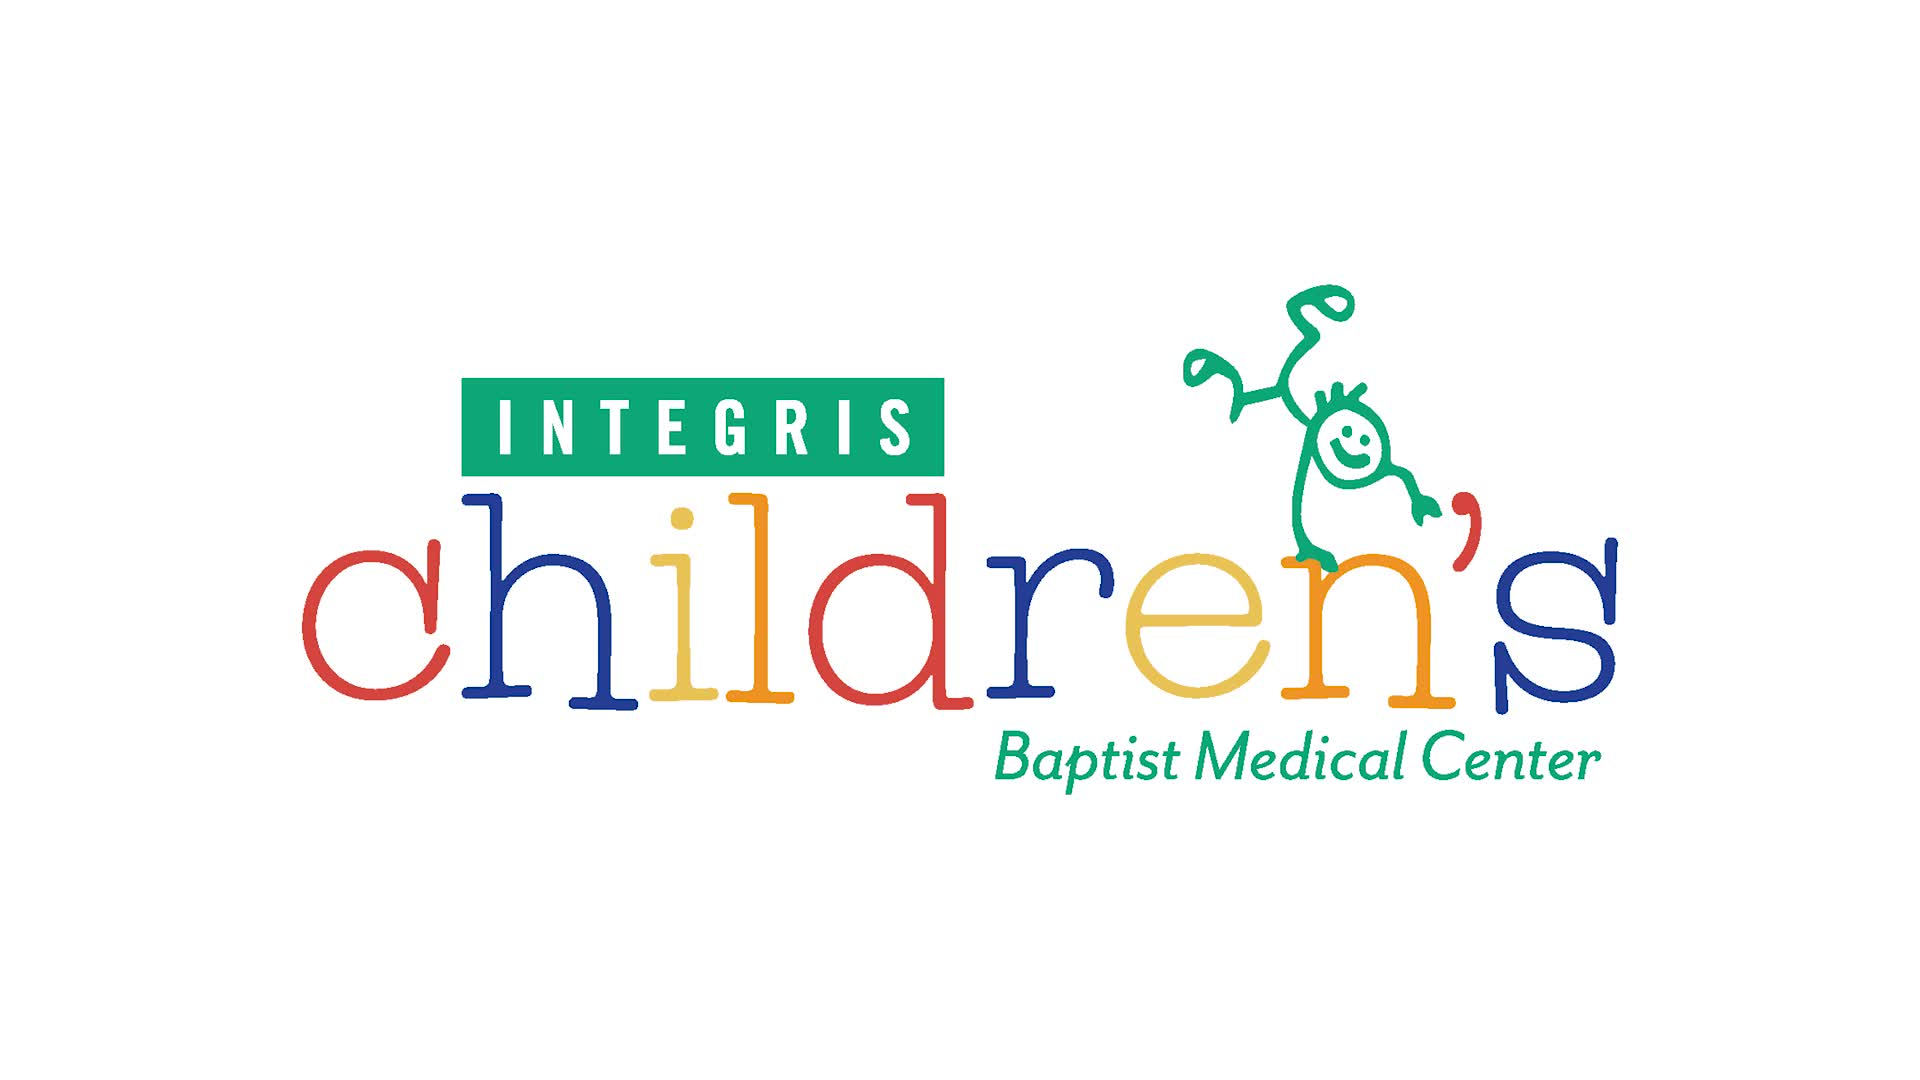 INTEGRIS Baptist Medical Center   INTEGRIS